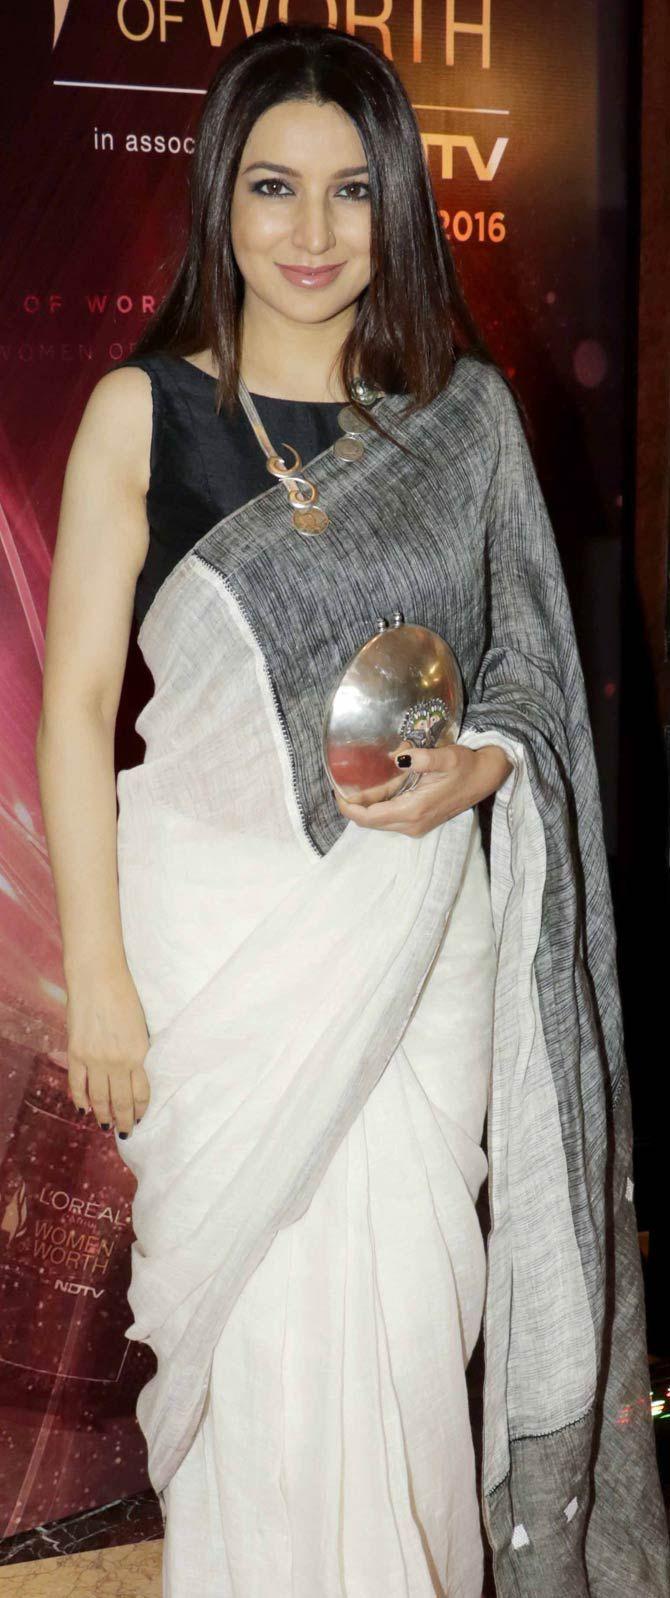 Tisca Chopra at the Women of Worth Awards. #Bollywood #Fashion #Style #Beauty #Hot #Desi #Saree